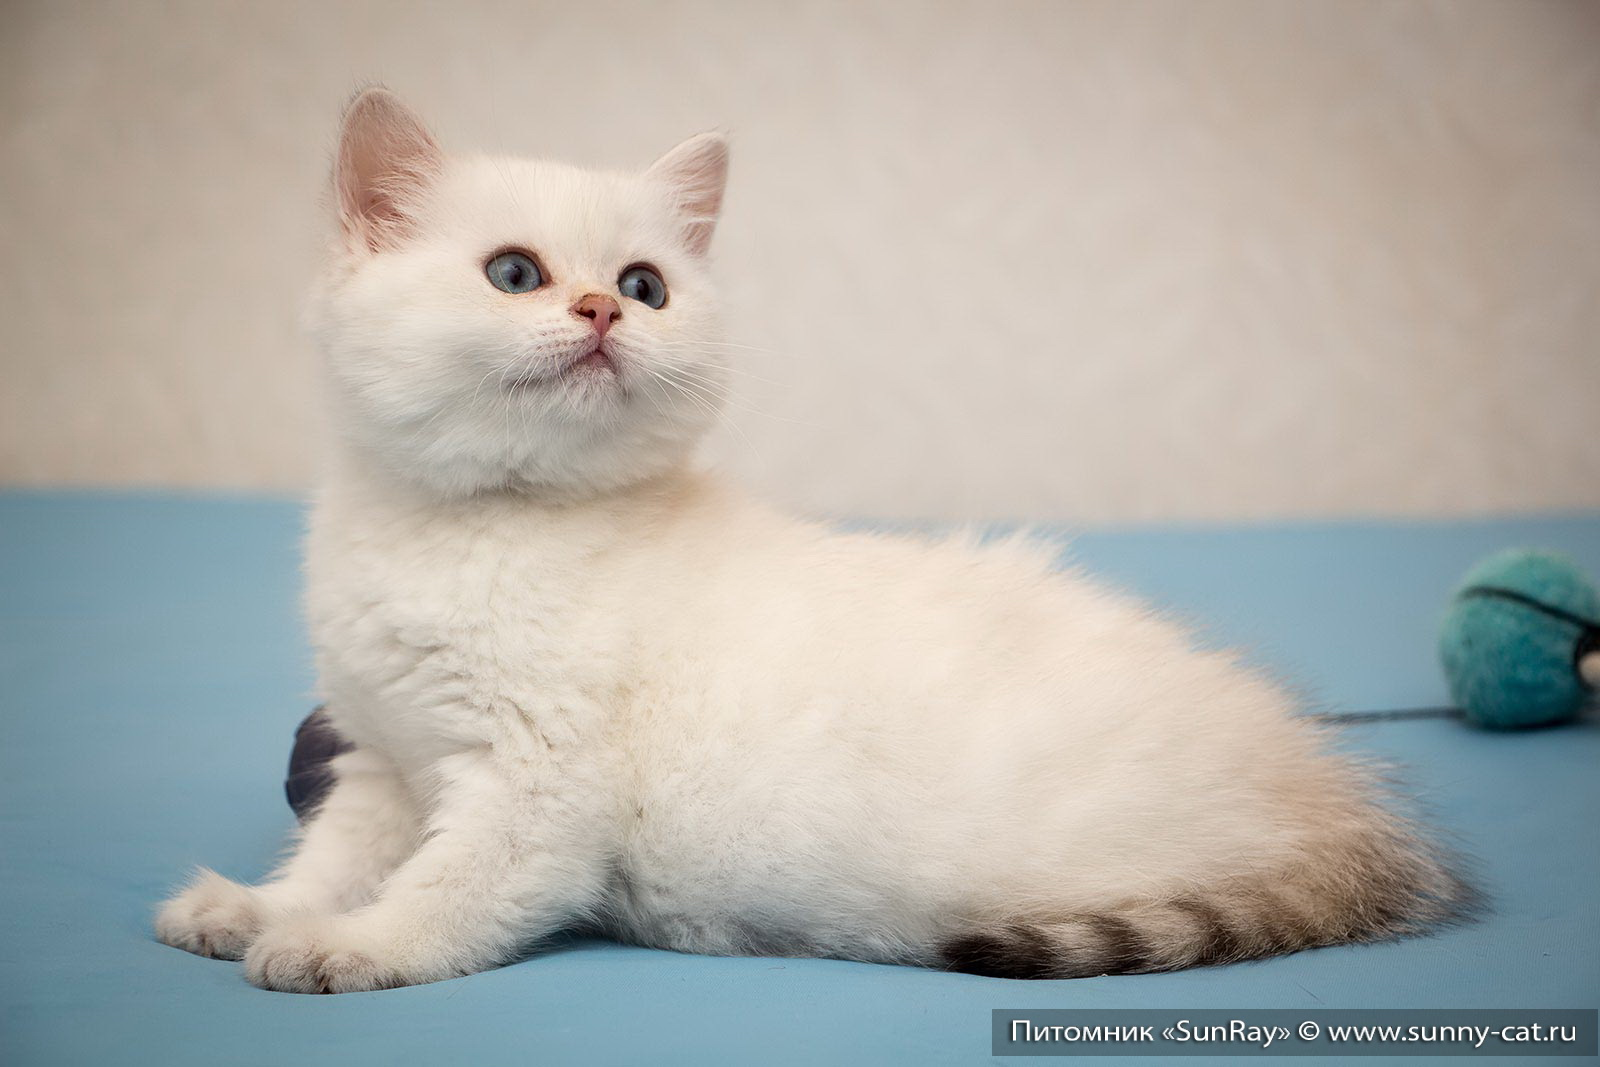 Как назвать кота по-английски